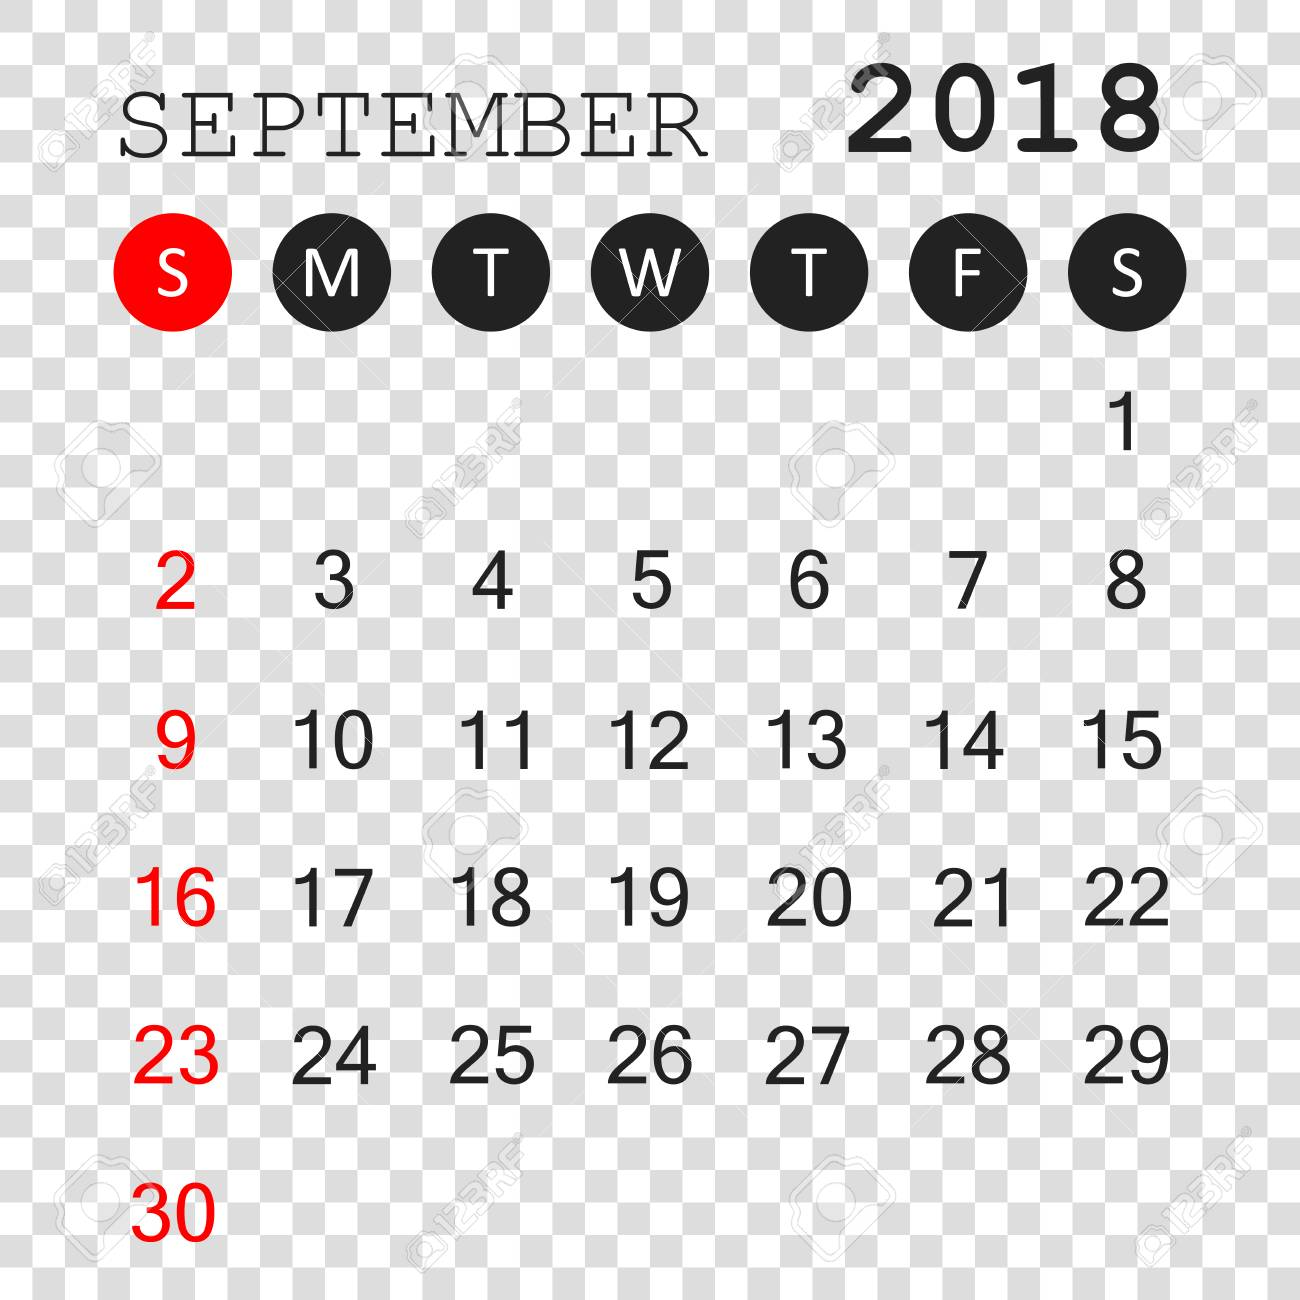 september 2018 calendar calendar planner design template week starts on sunday business vector